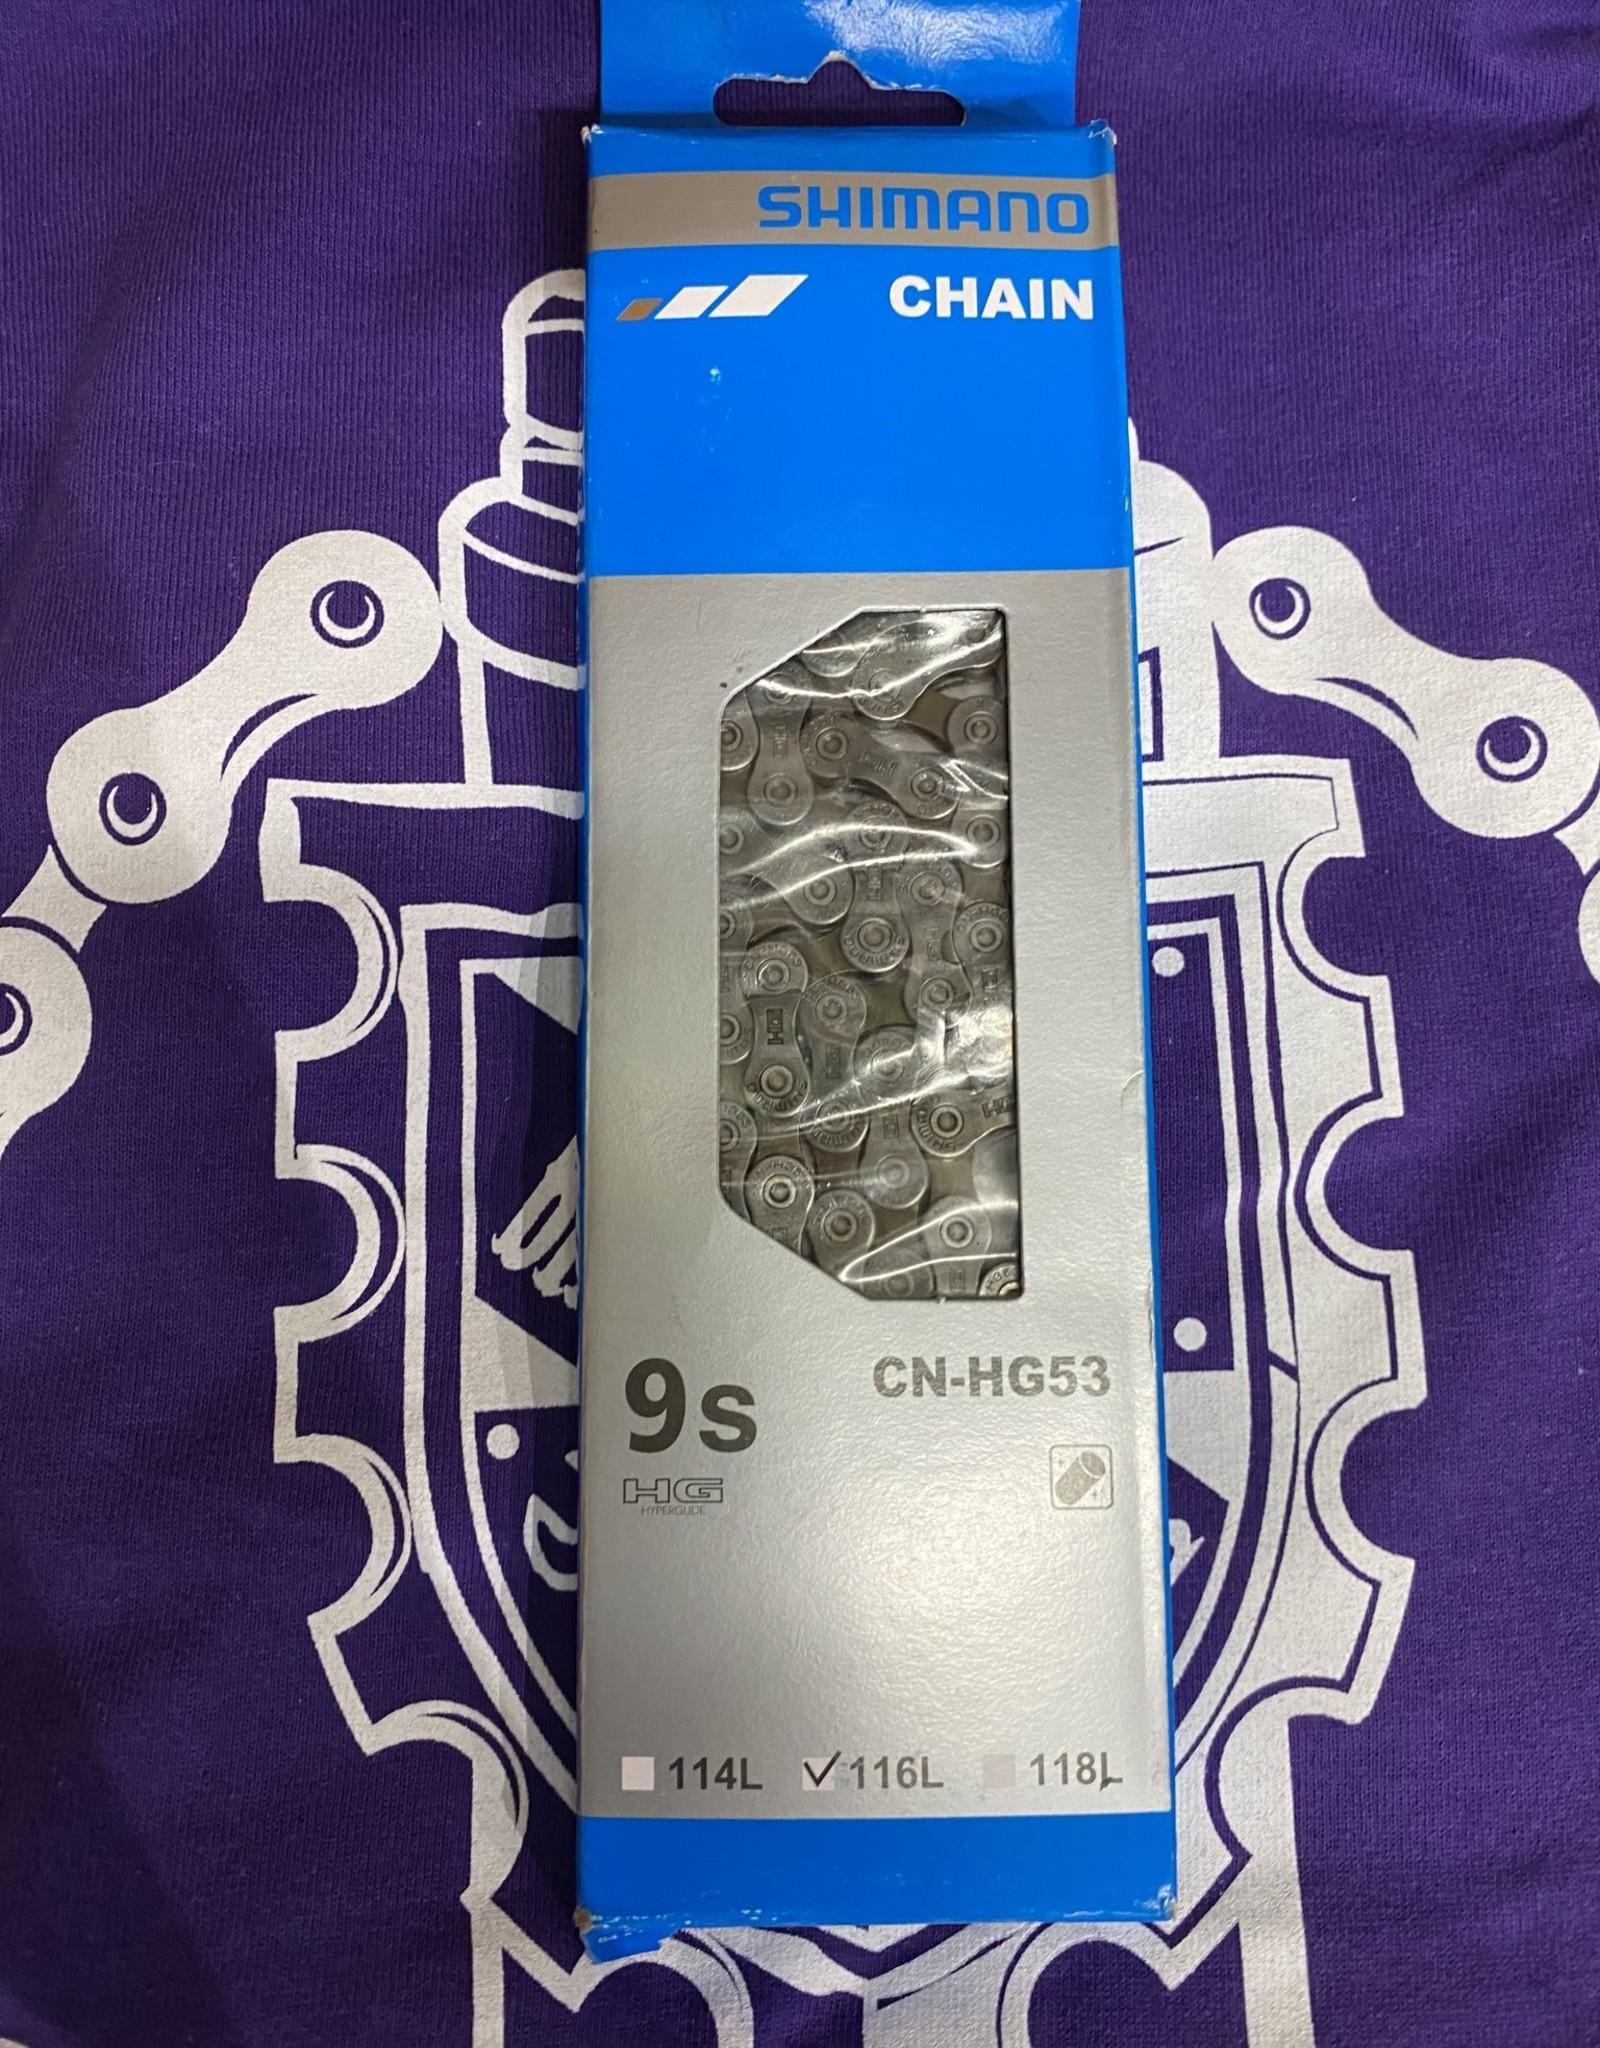 Shimano Shimano CN-HG53 Chain - 9-Speed, 116 Links, Gray